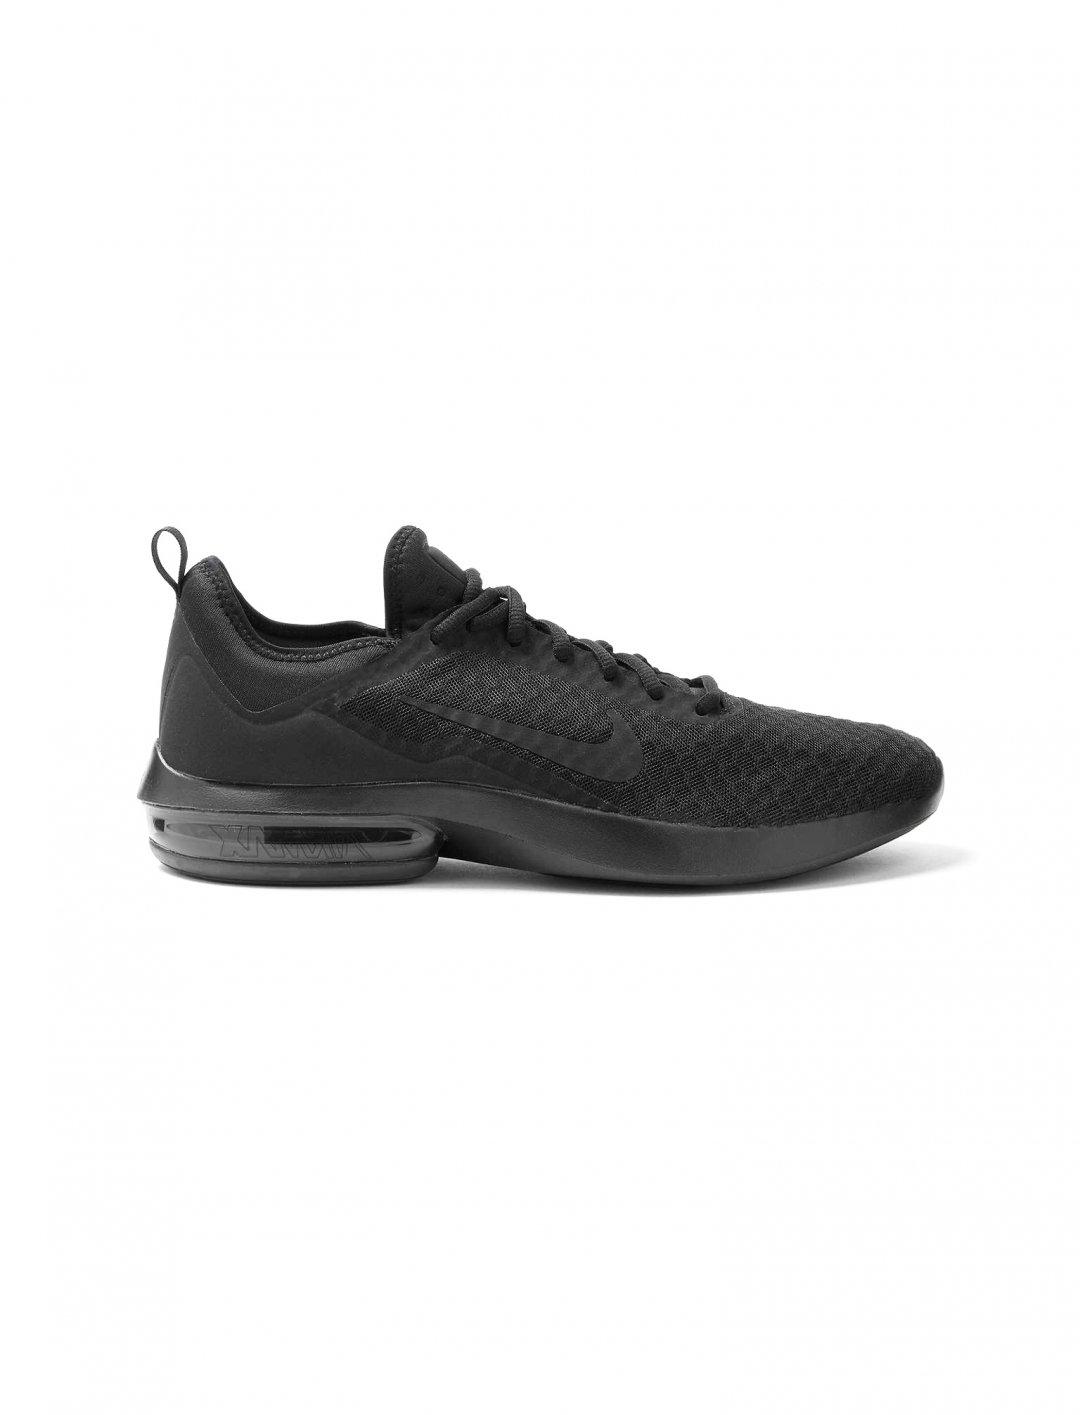 "Nike Air Max Kantara {""id"":12,""product_section_id"":1,""name"":""Shoes"",""order"":12} Nike"